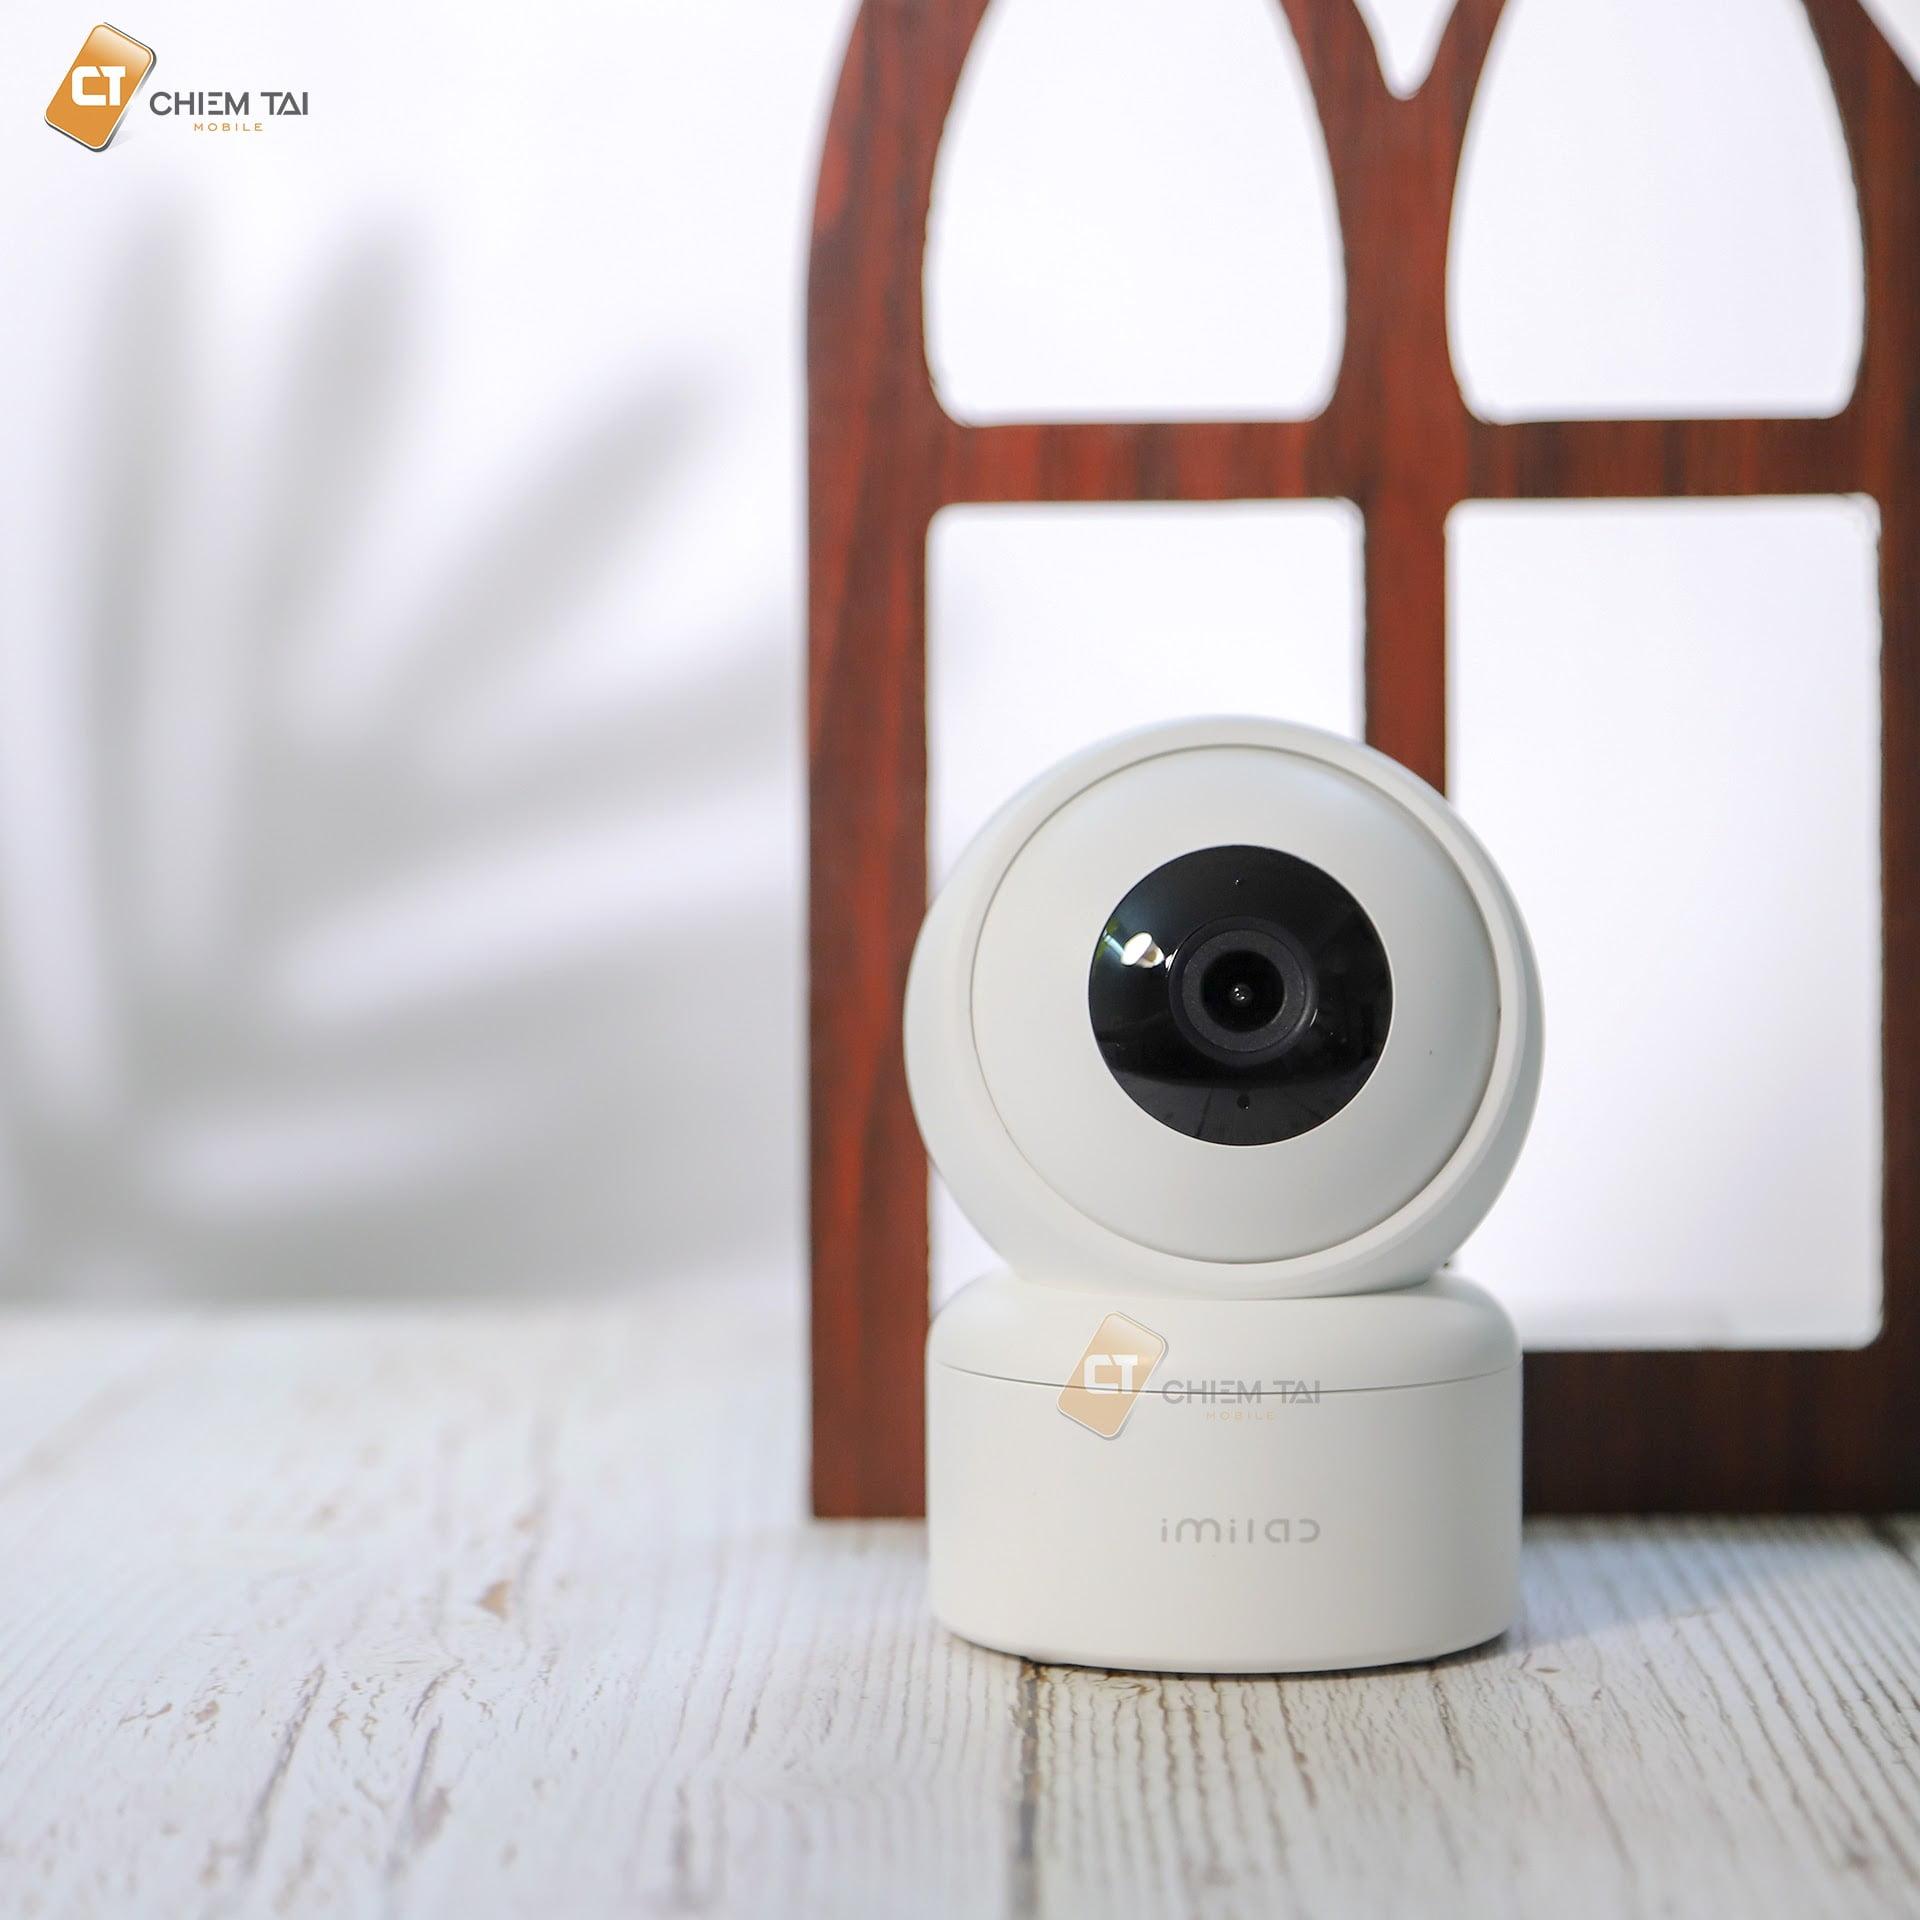 camera ip giam sat imilab c20 hd 1080p 6007d1b88a642